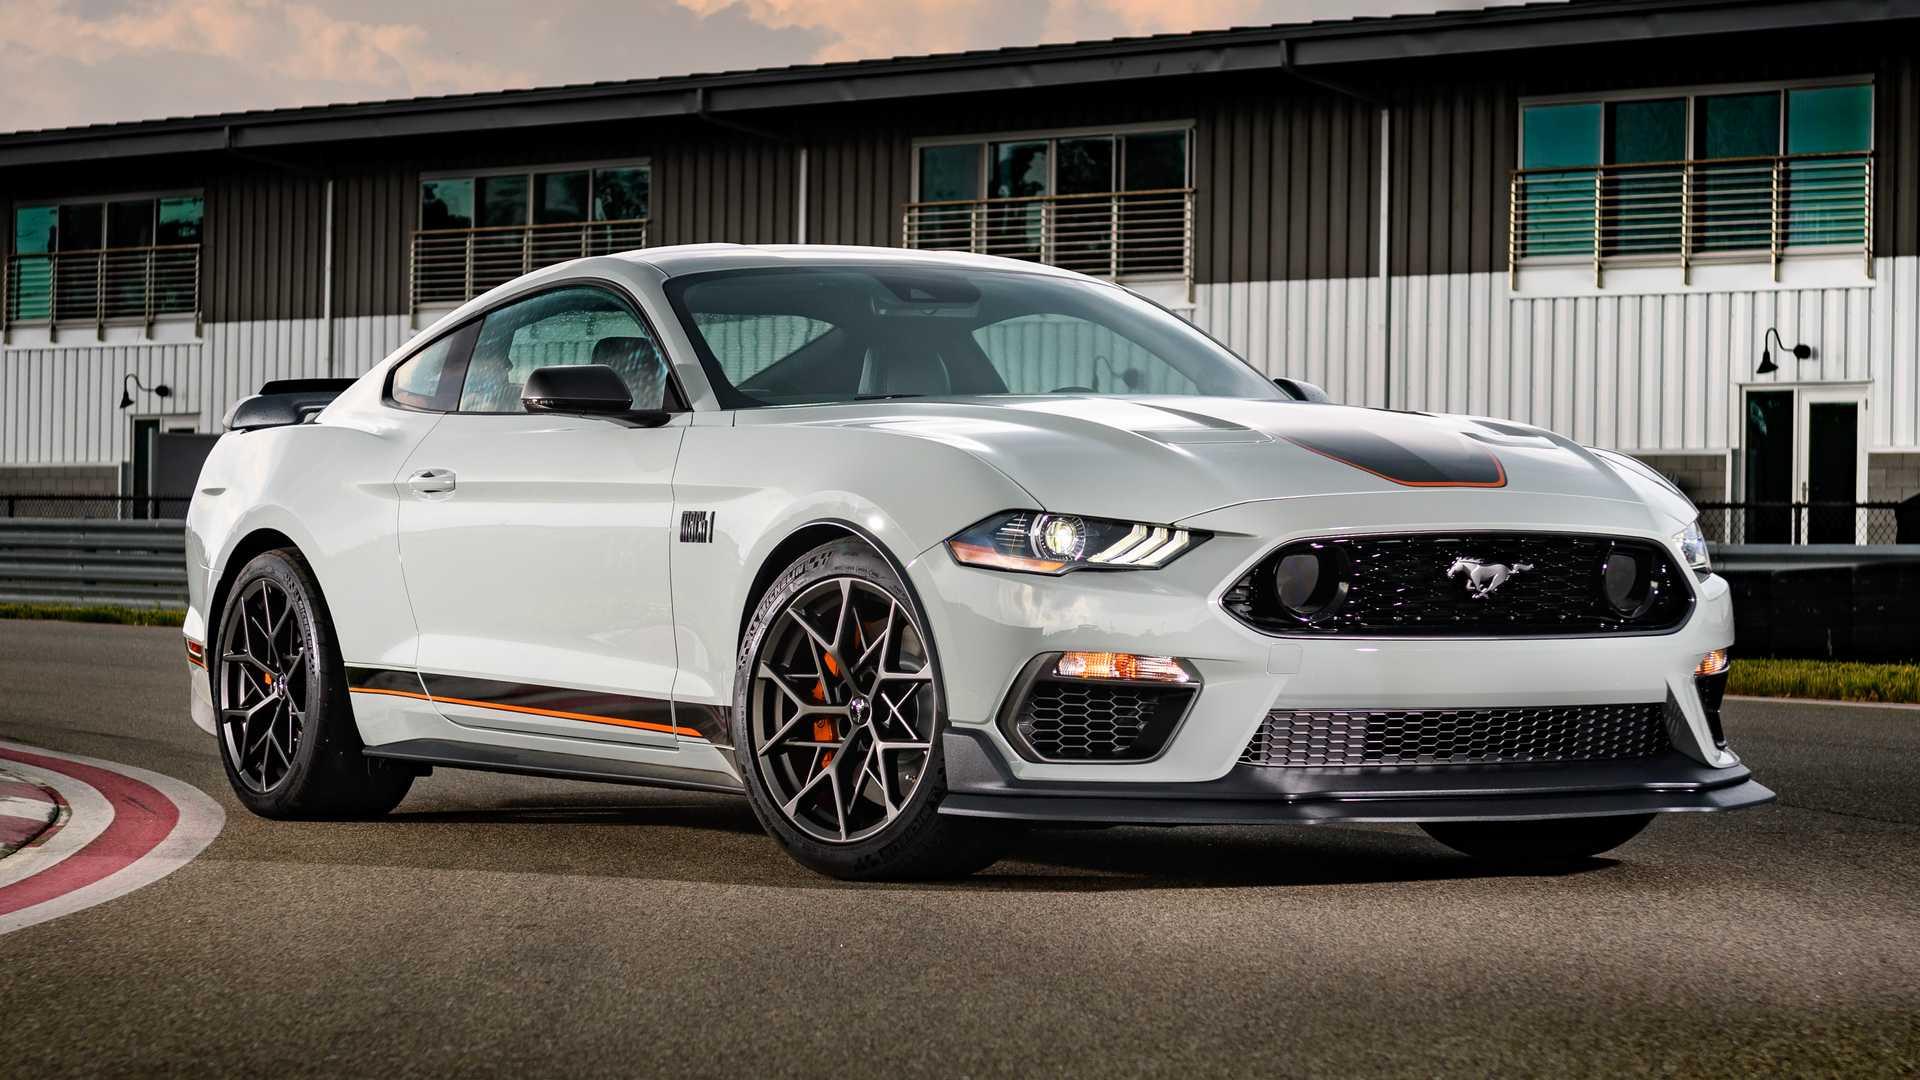 2022 Ford Mustang с двигателем V8 потеряет 10 лошадиных сил